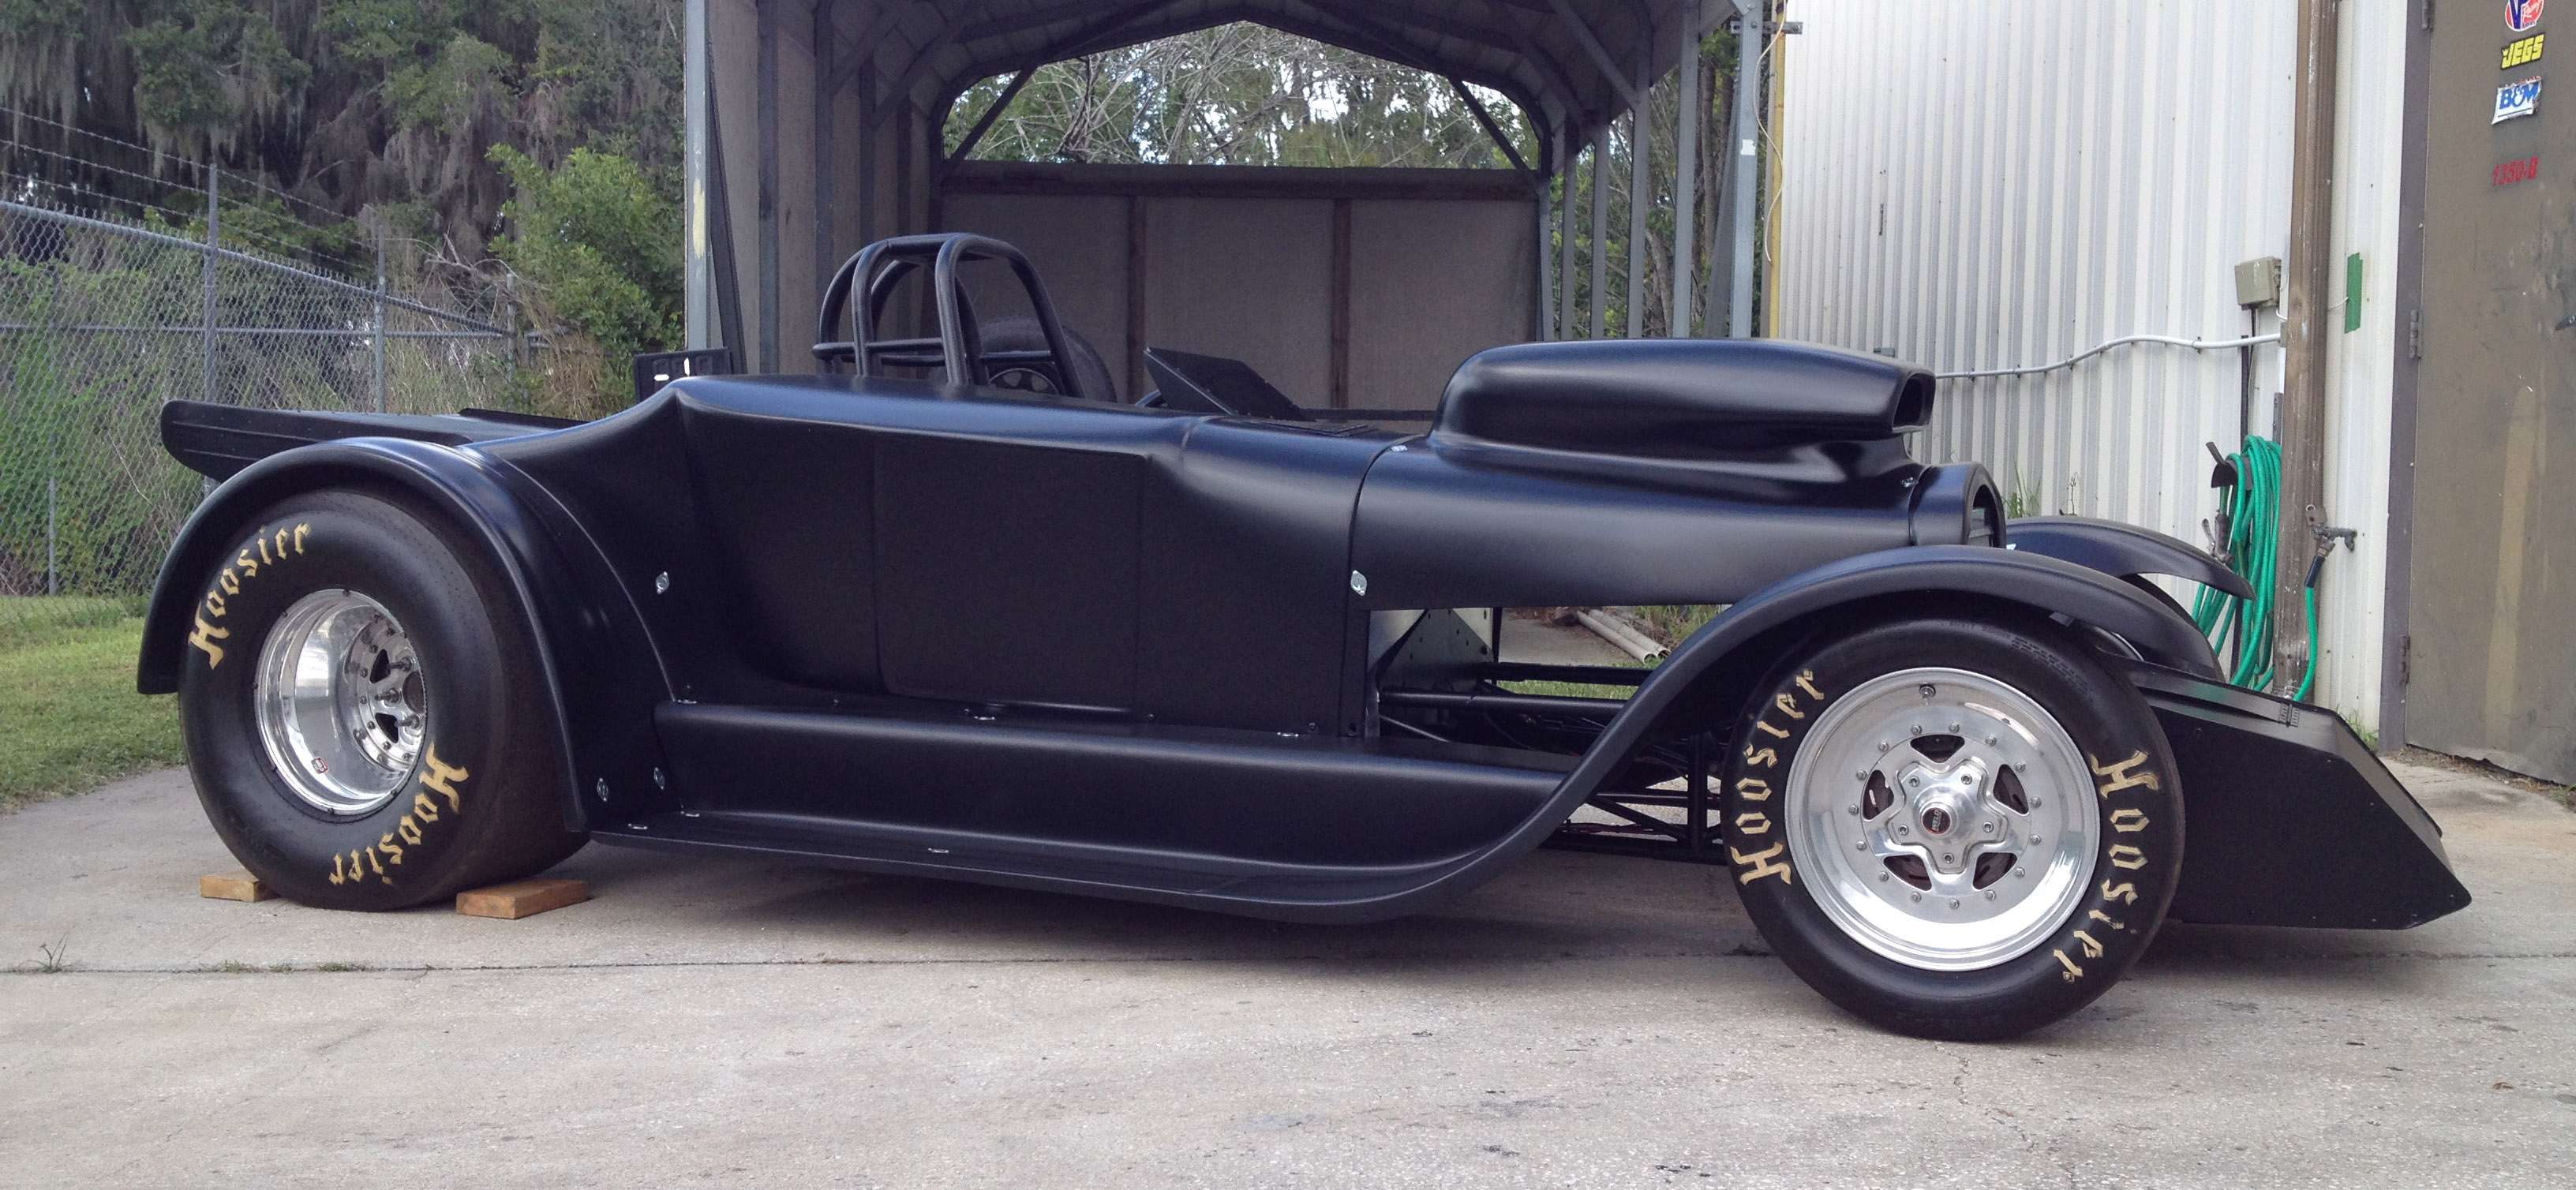 Automotive Paint Colors >> 27 Roadster in Satin Black III | Hot Rod Black Car ...